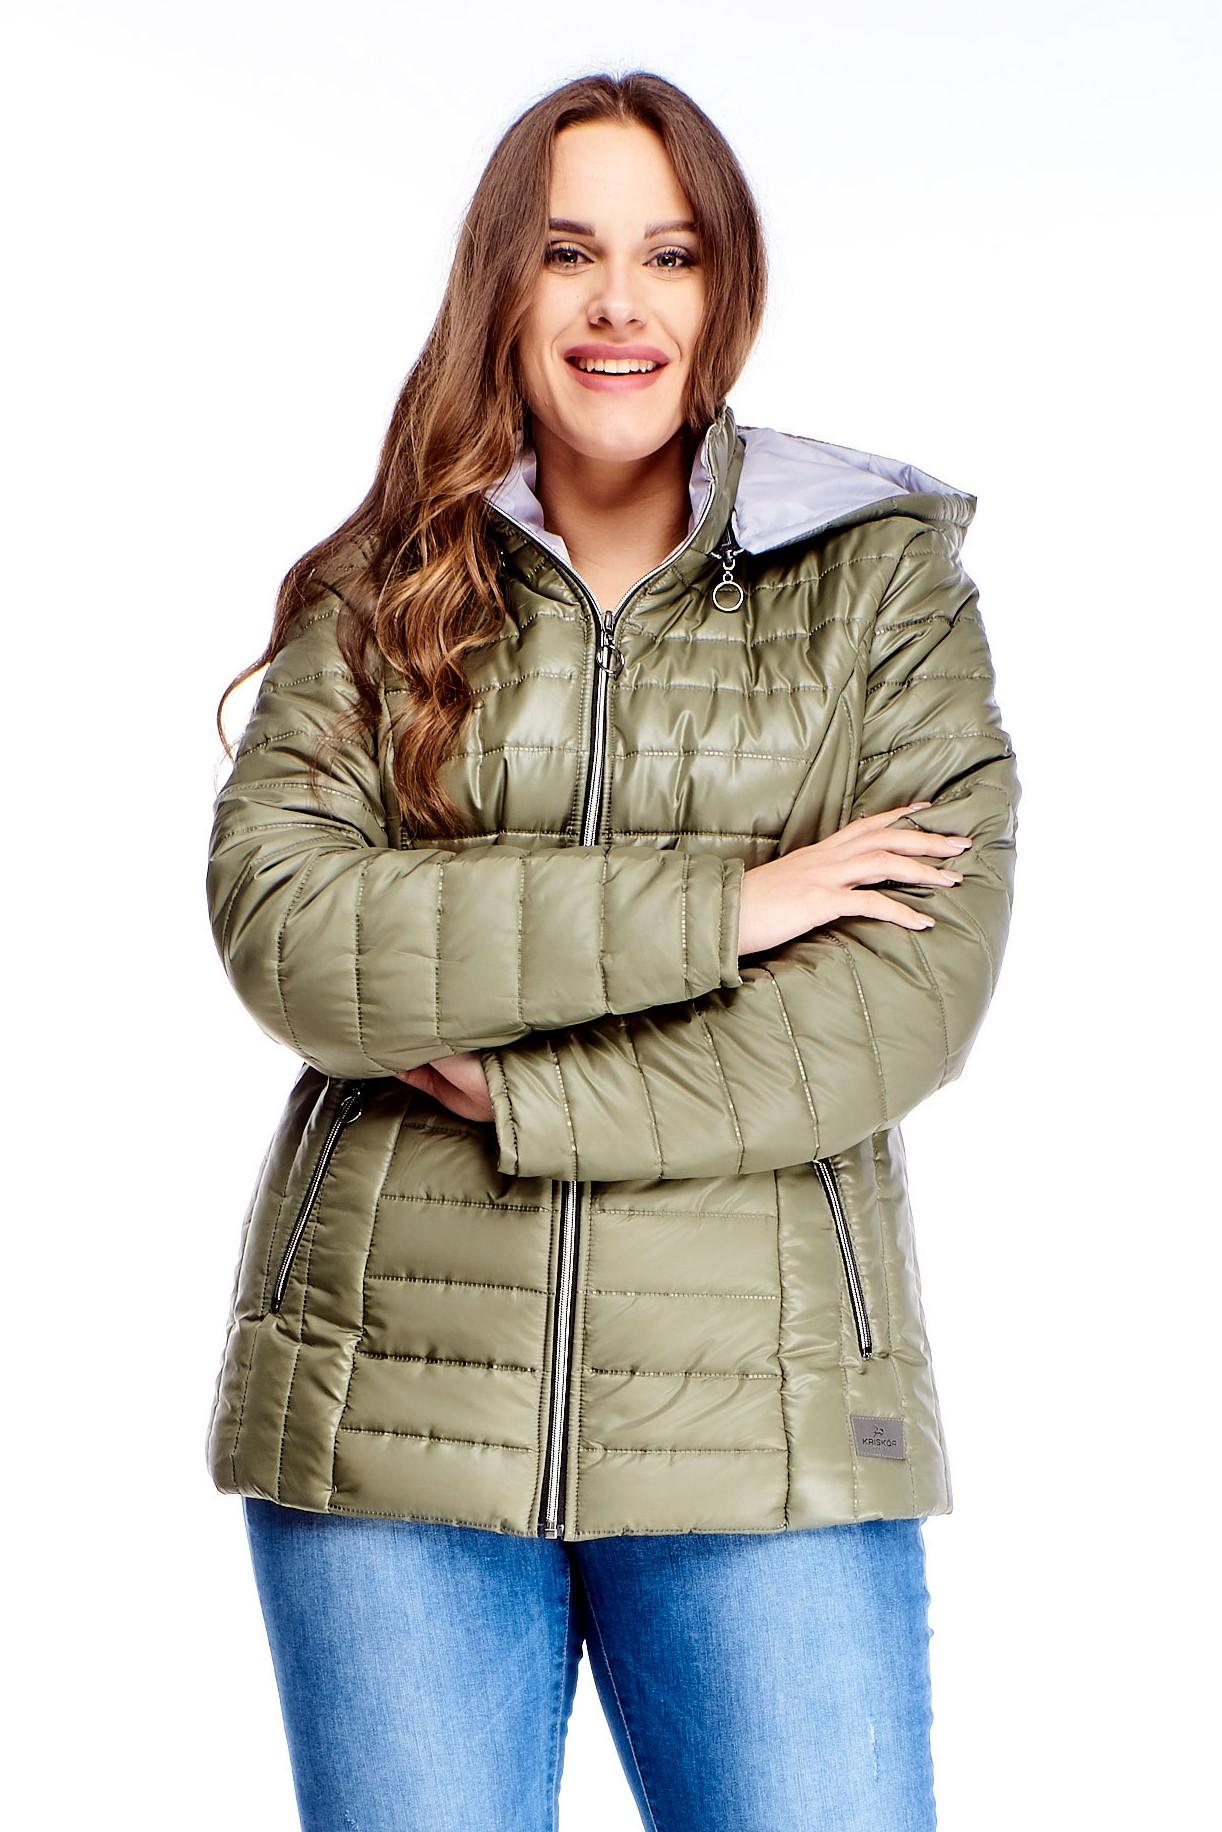 Krátka dámska zimná bunda v zelenej farbe na zips